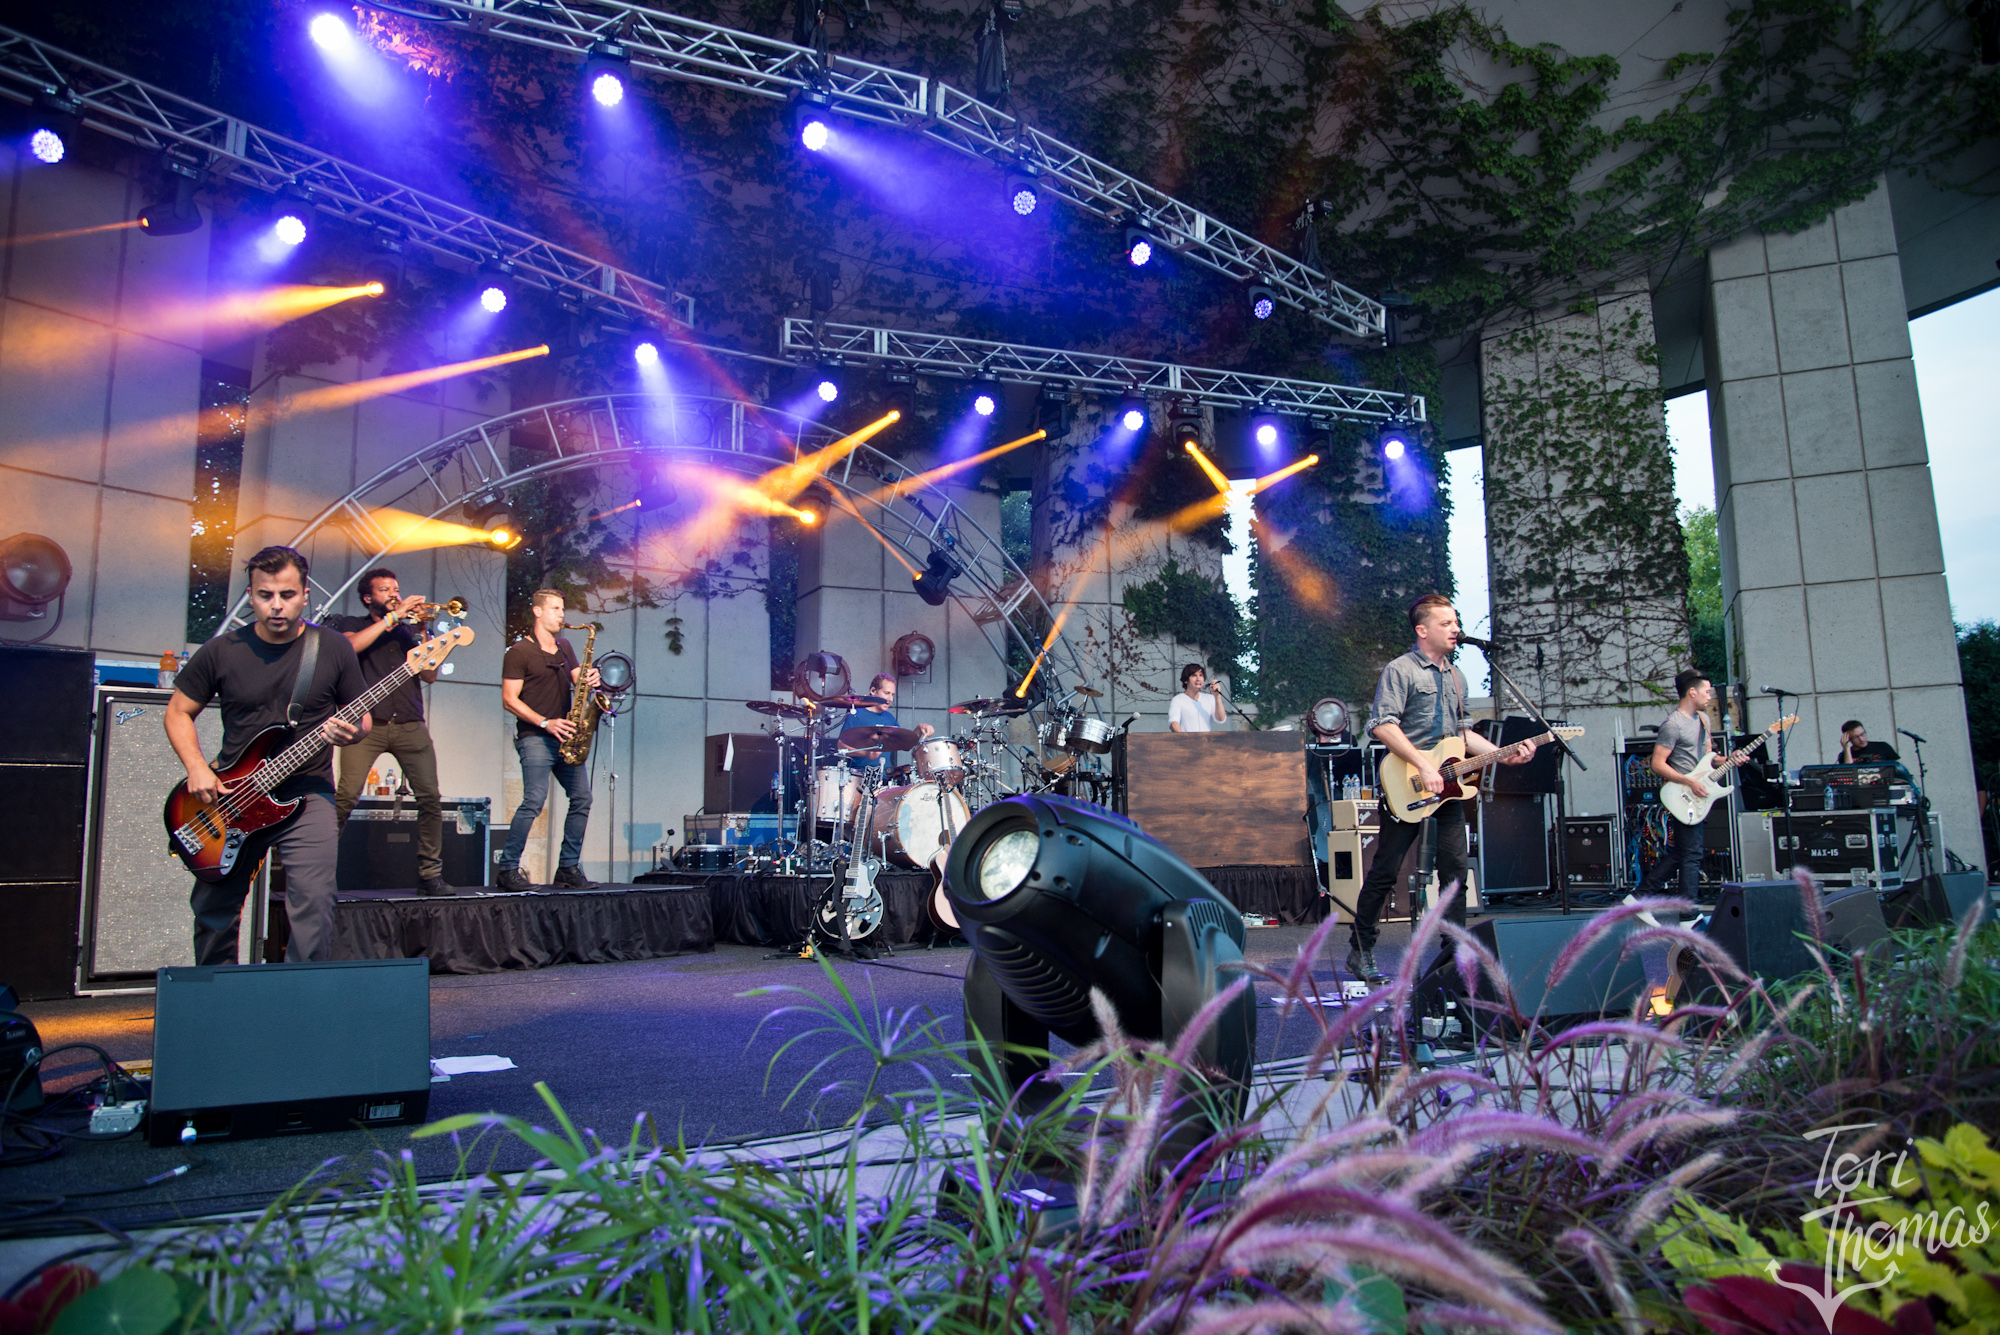 Blondie Tedeschi Trucks Band O A R To Rock 2018 Meijer Gardens Concert Series